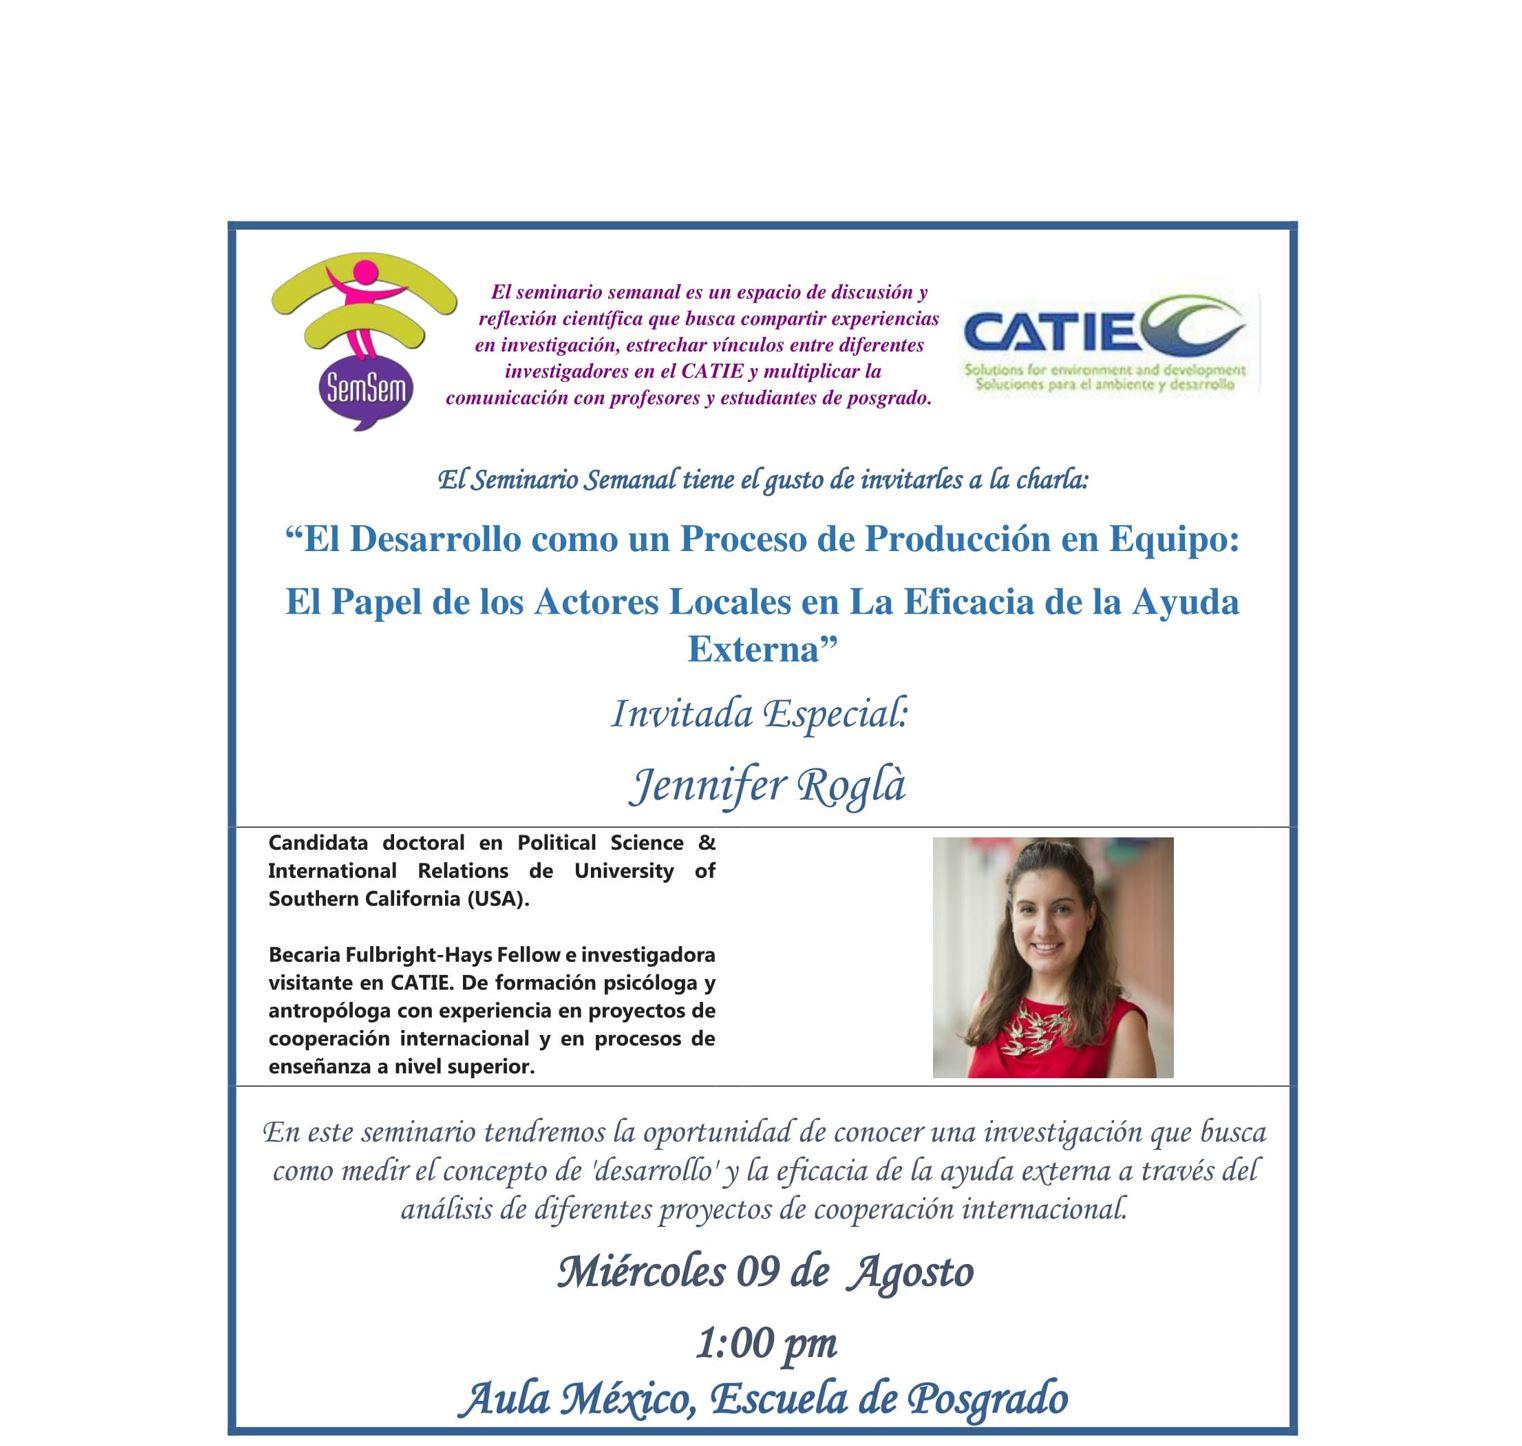 Speaking: Presentation at the CATIE SemSem